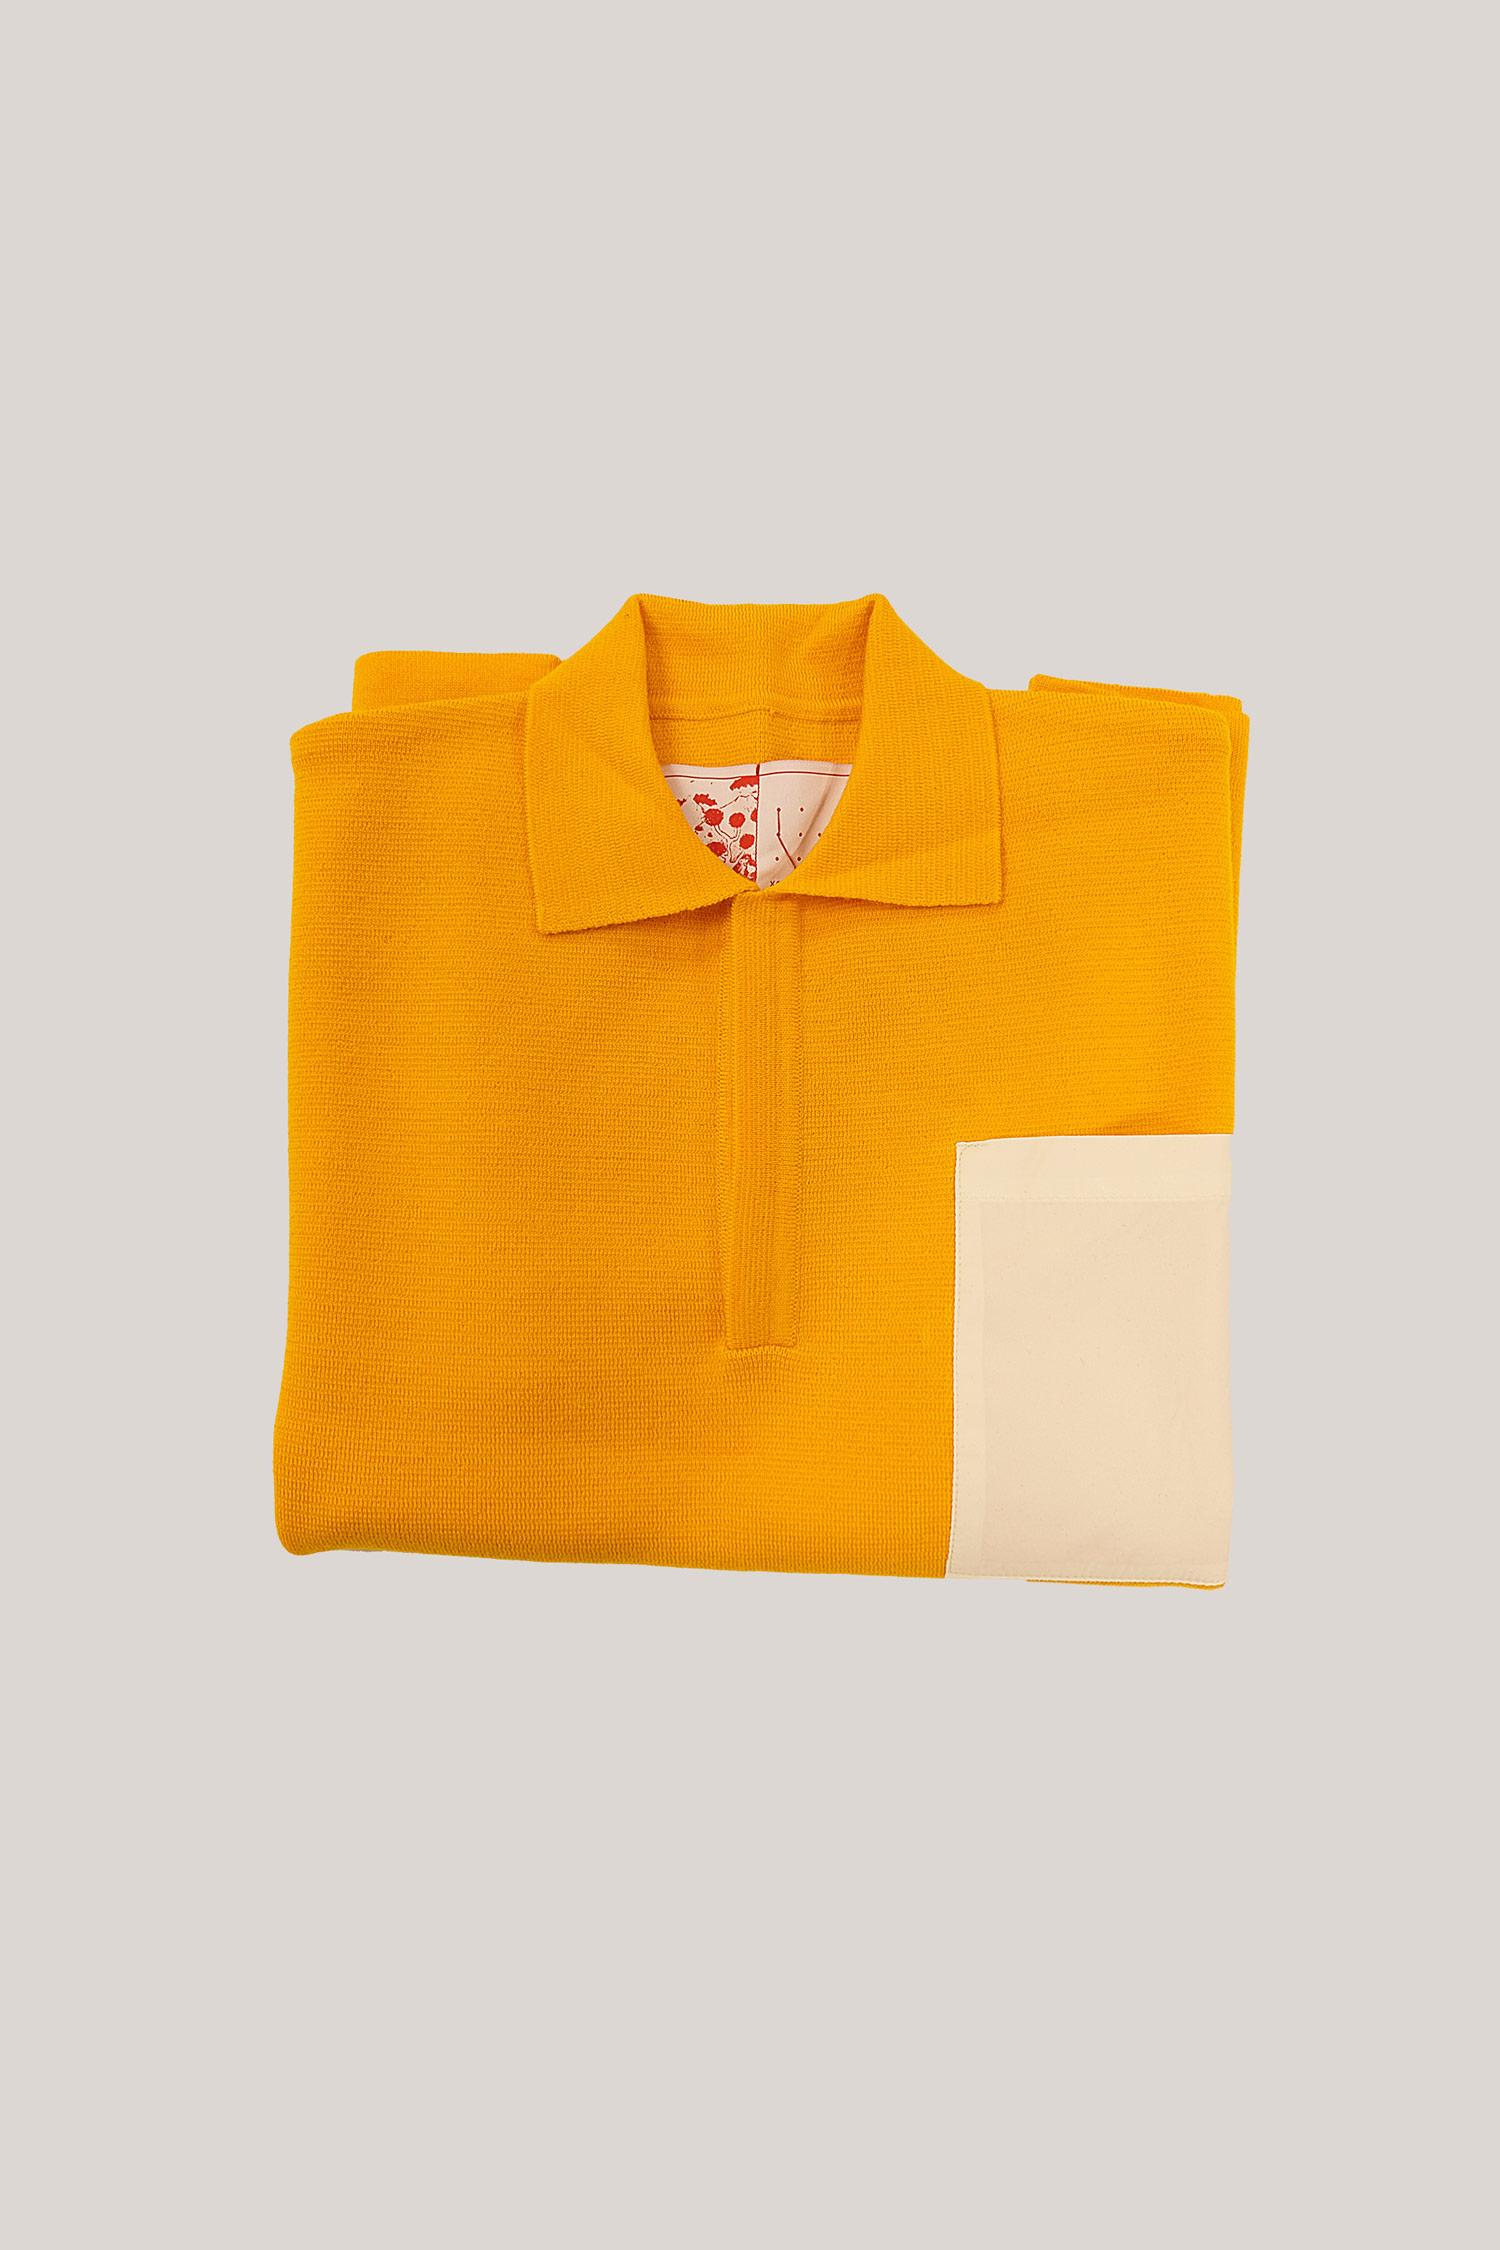 38-Knitted-tshirt-orange-3